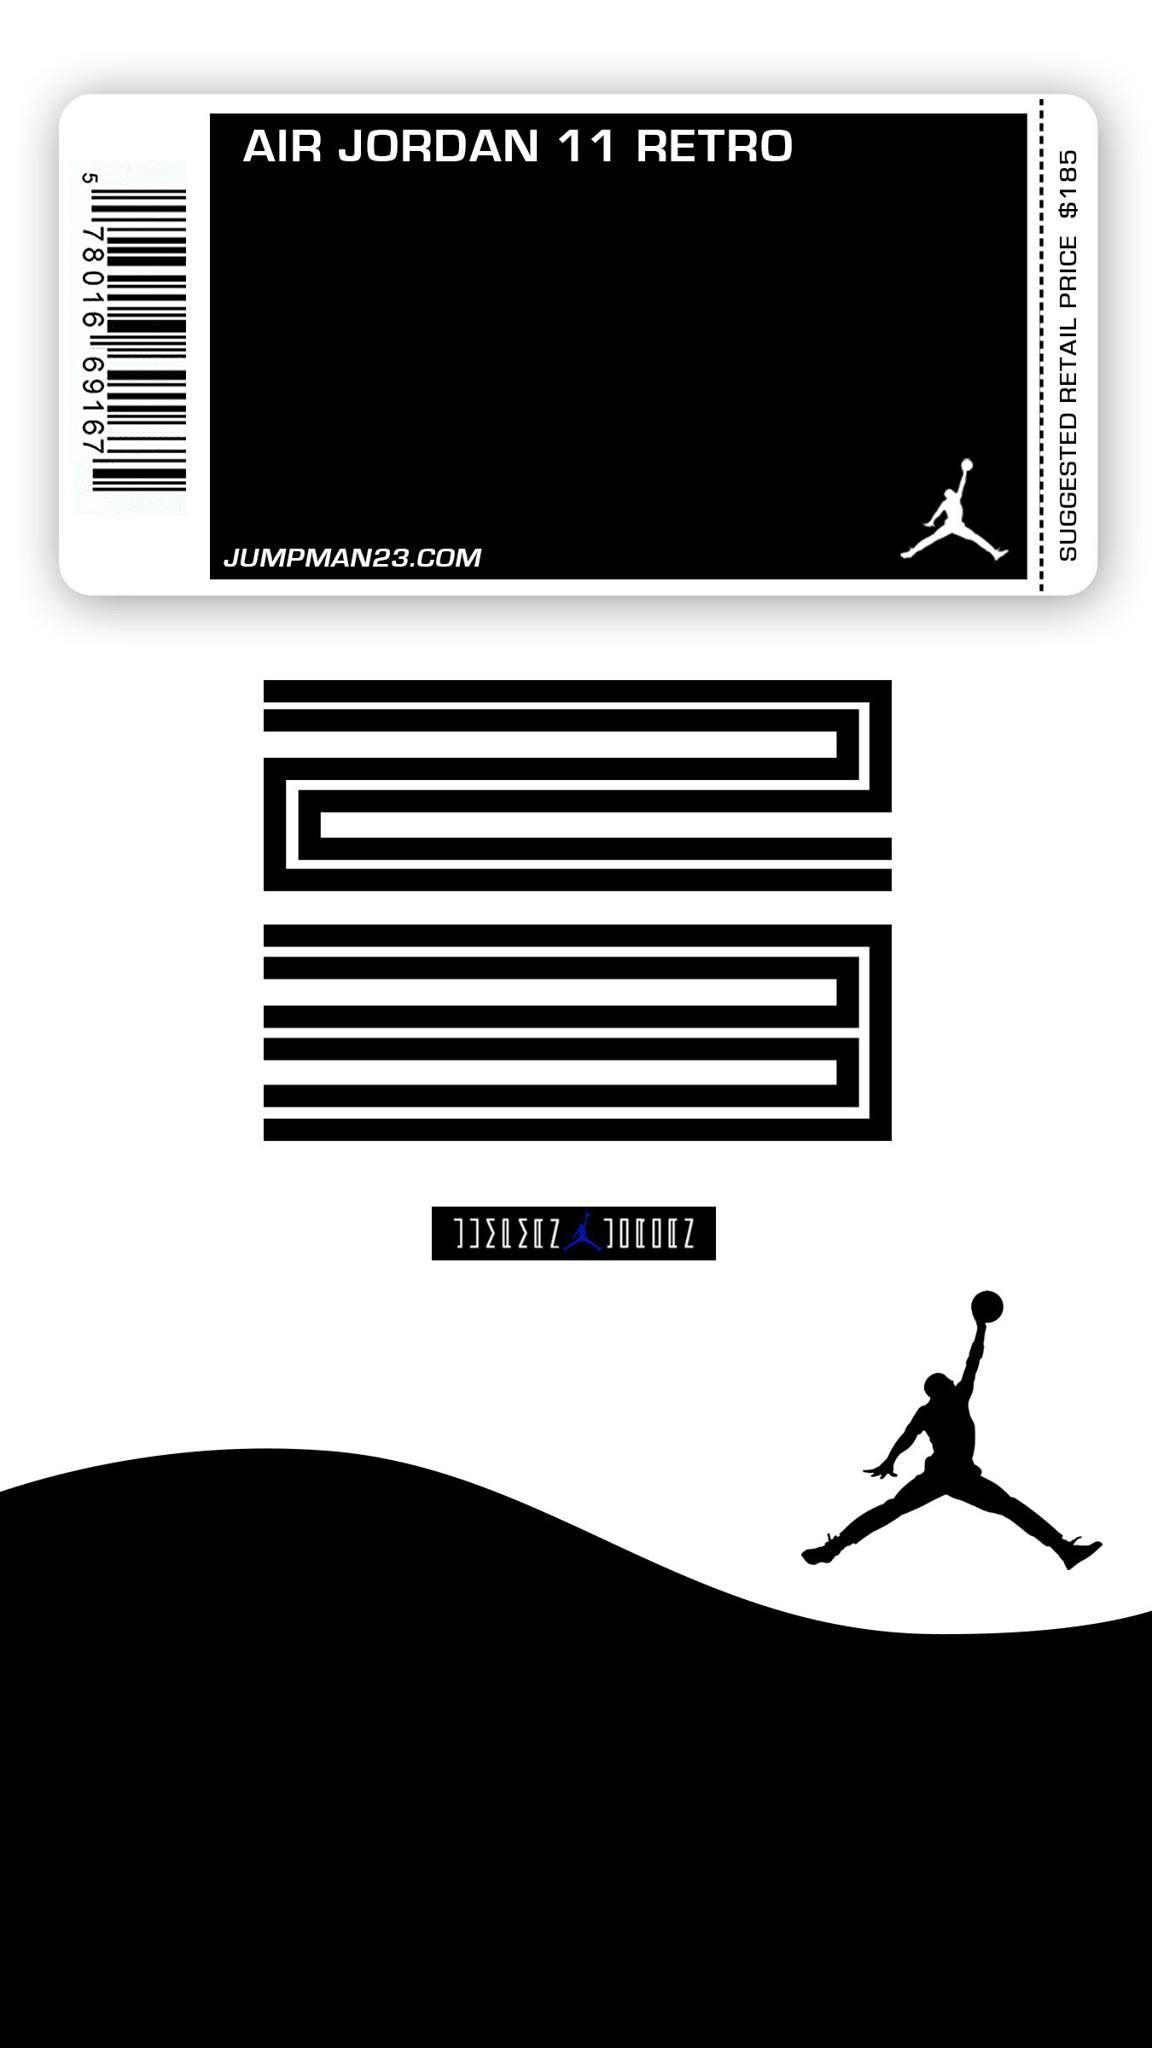 Jordan 11 Wallpaper Iphone 1152x2048 Download Hd Wallpaper Wallpapertip